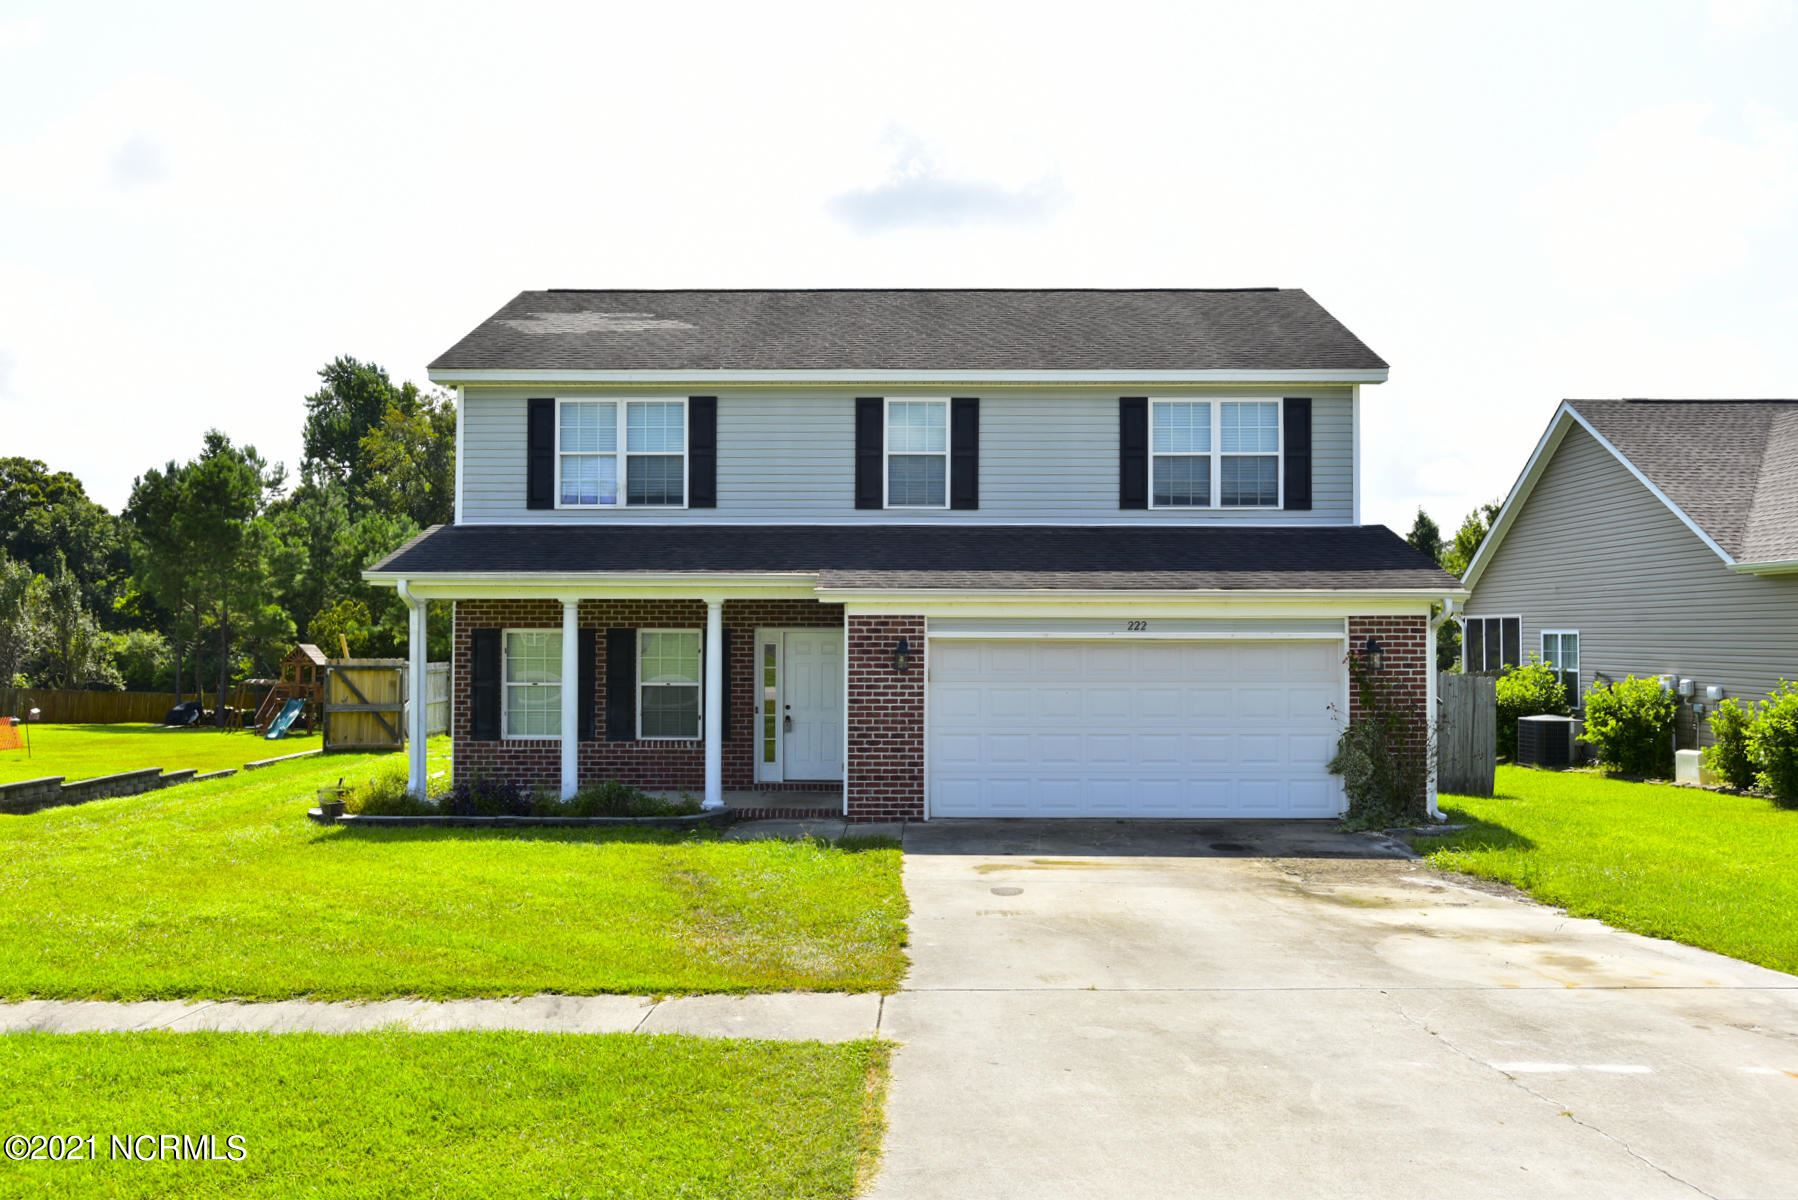 Photo of 222 Emerald Ridge Road, Jacksonville, NC 28546 (MLS # 100286742)